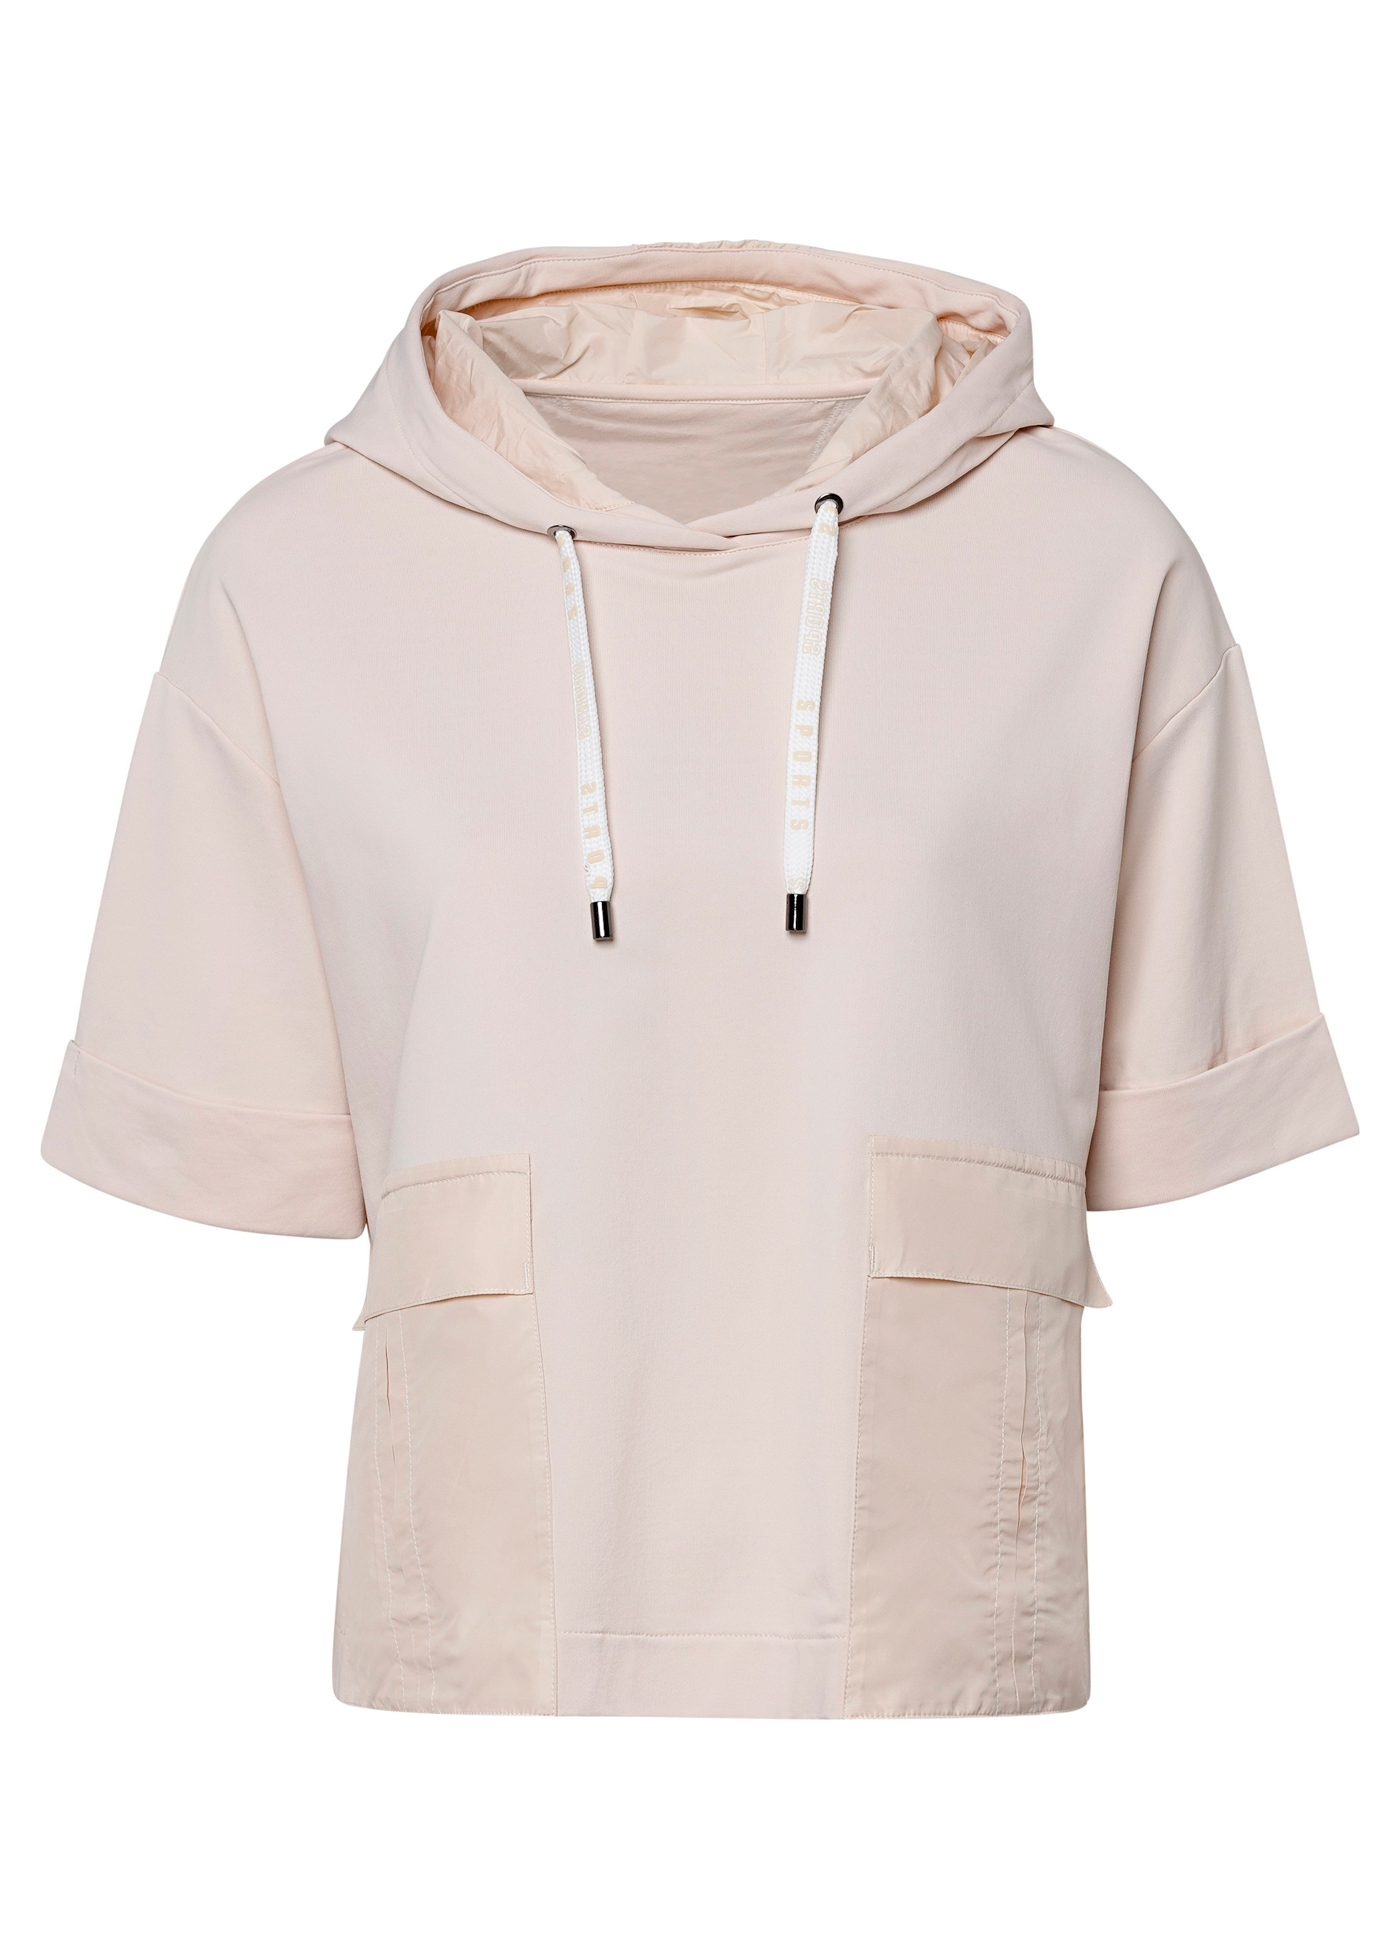 Sweat-Shirt image number 0